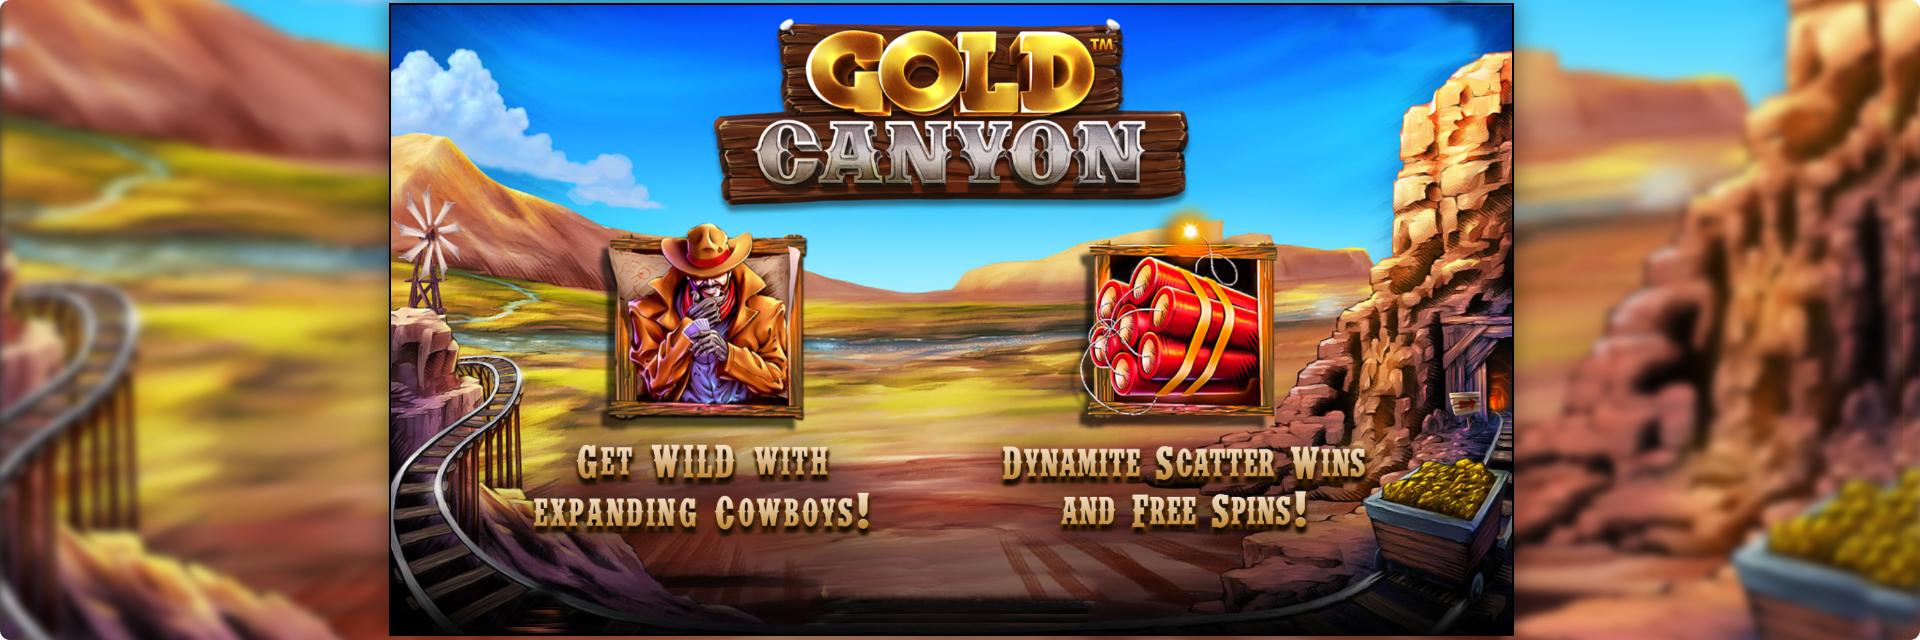 Gold Canyon Slot Machine.